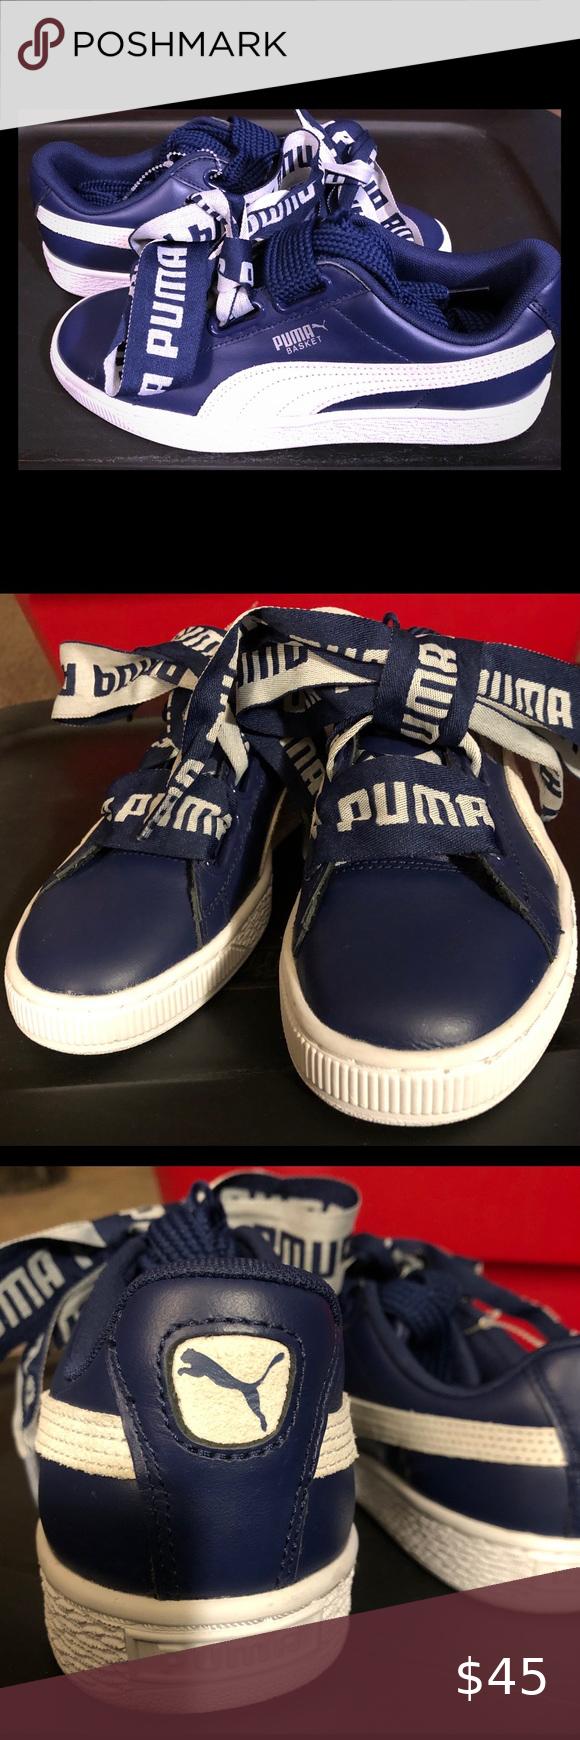 Puma Basket Heart DE Leather Trainer